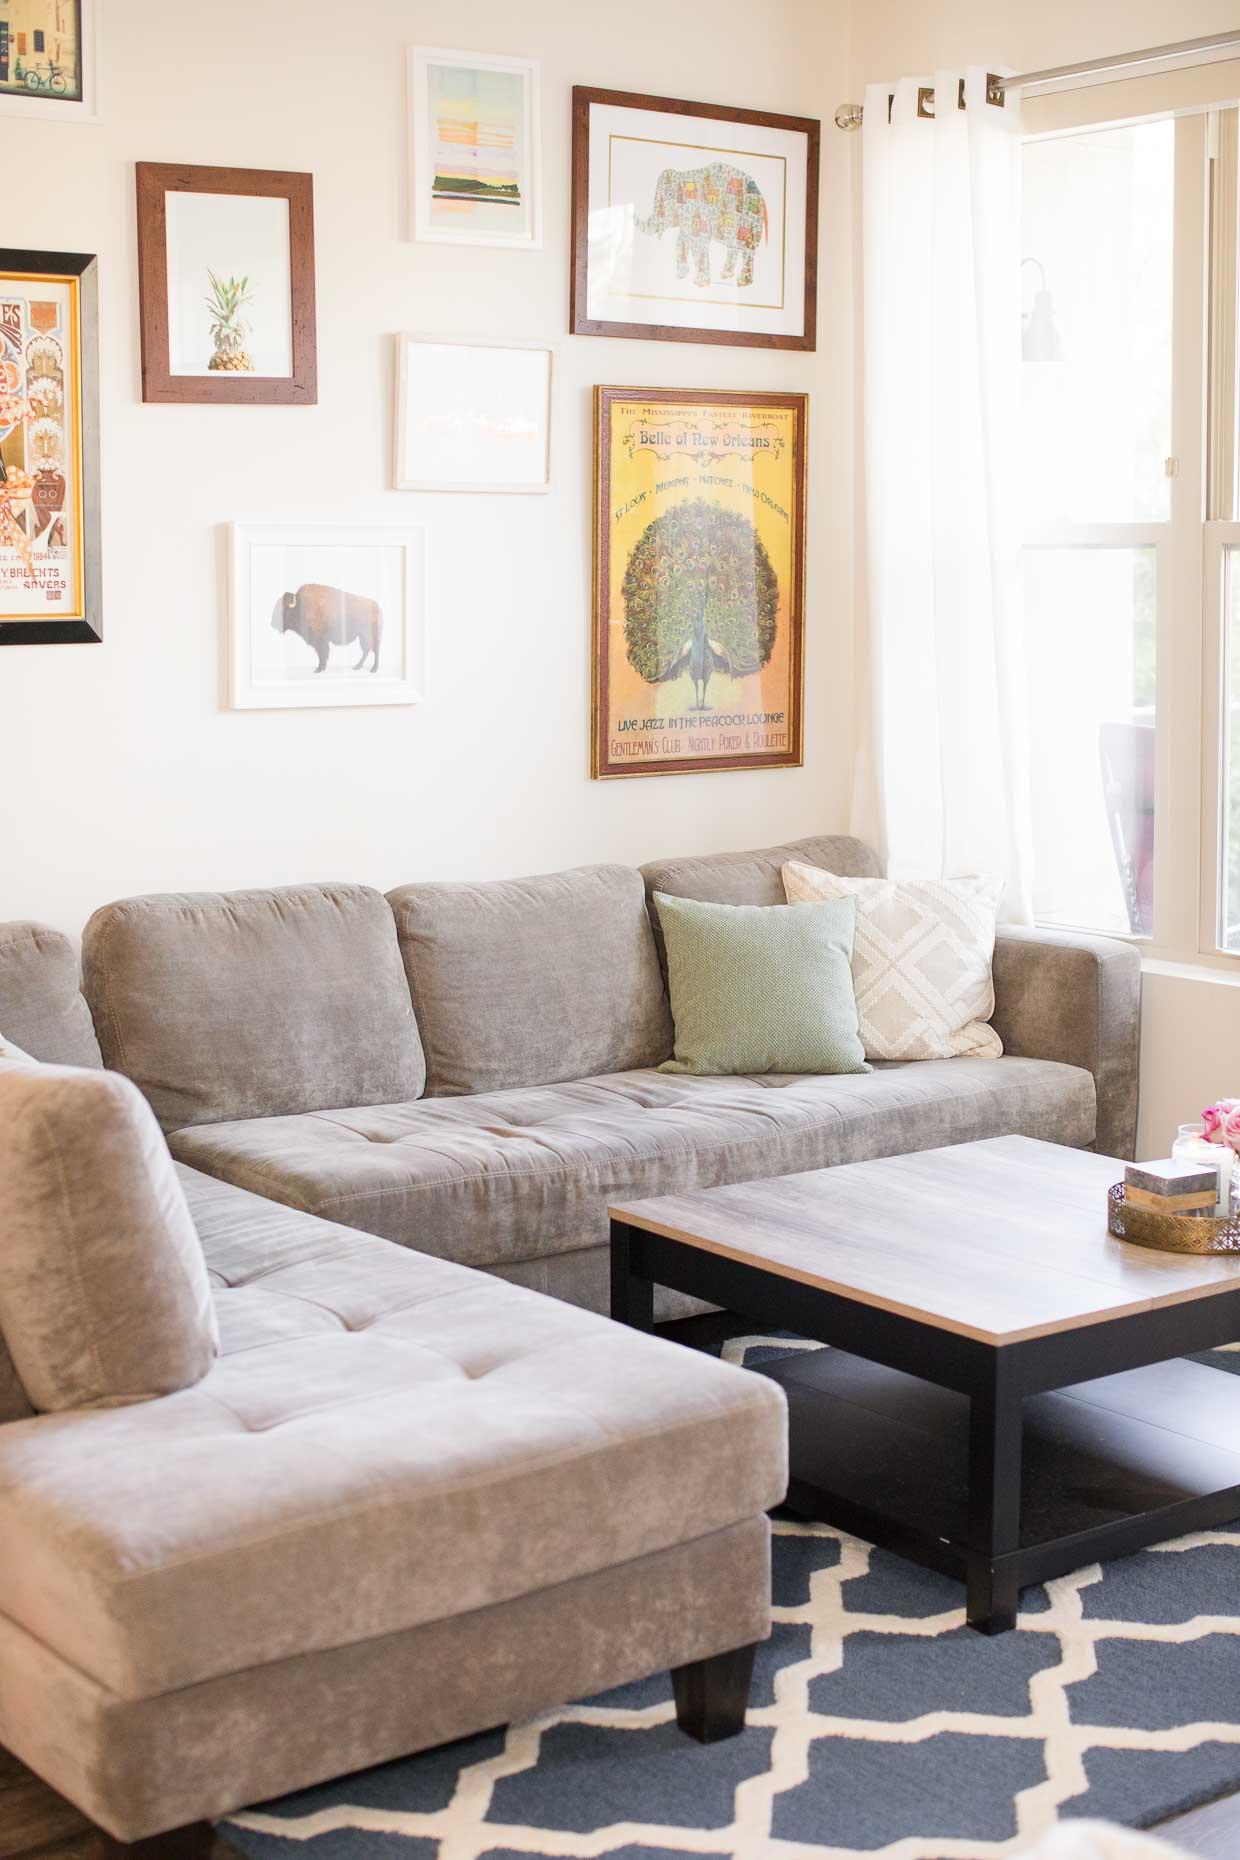 Atlanta Apartment Tour - Affordable Home Decor - Poor Little It Girl